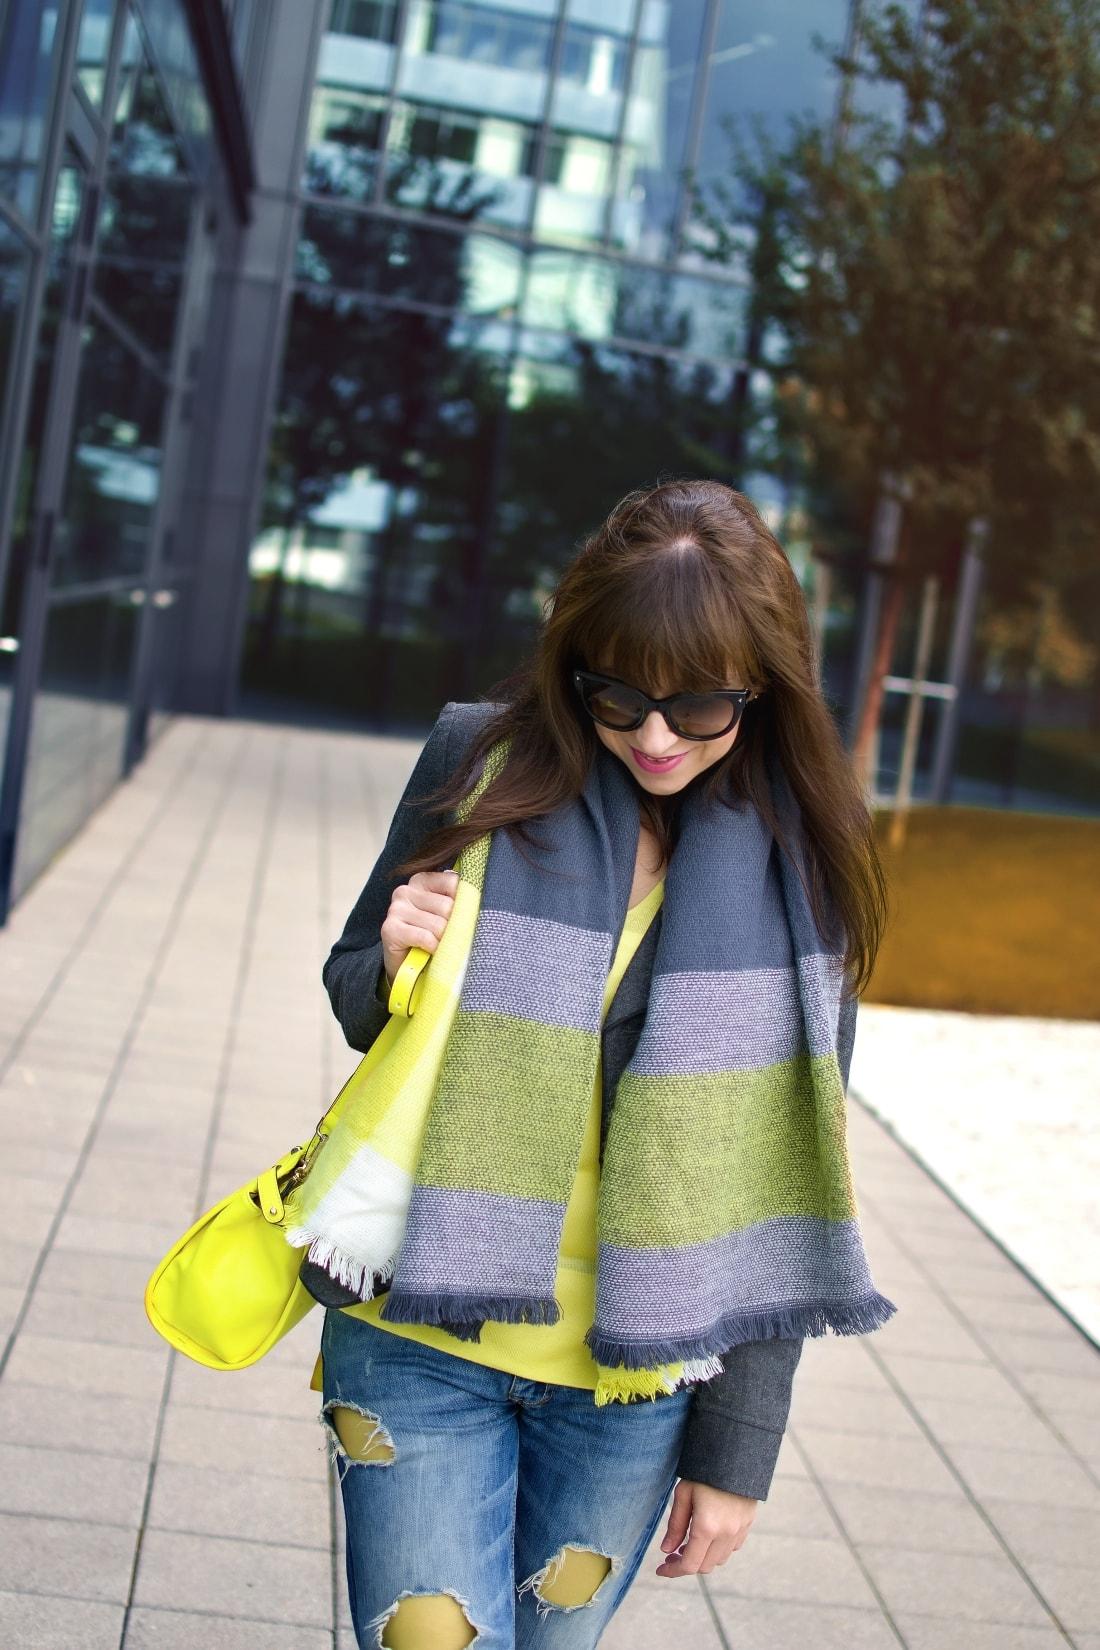 I LOVE COLOURED TIGHTS_Katharine-fashion is beautiful_blog 2_autumn look_Ripped jeans_Žltý sveter Zara_Žltá kabelka Nucelle_Čierne slipony Eobuv_Katarína Jakubčová_Fashion blogger